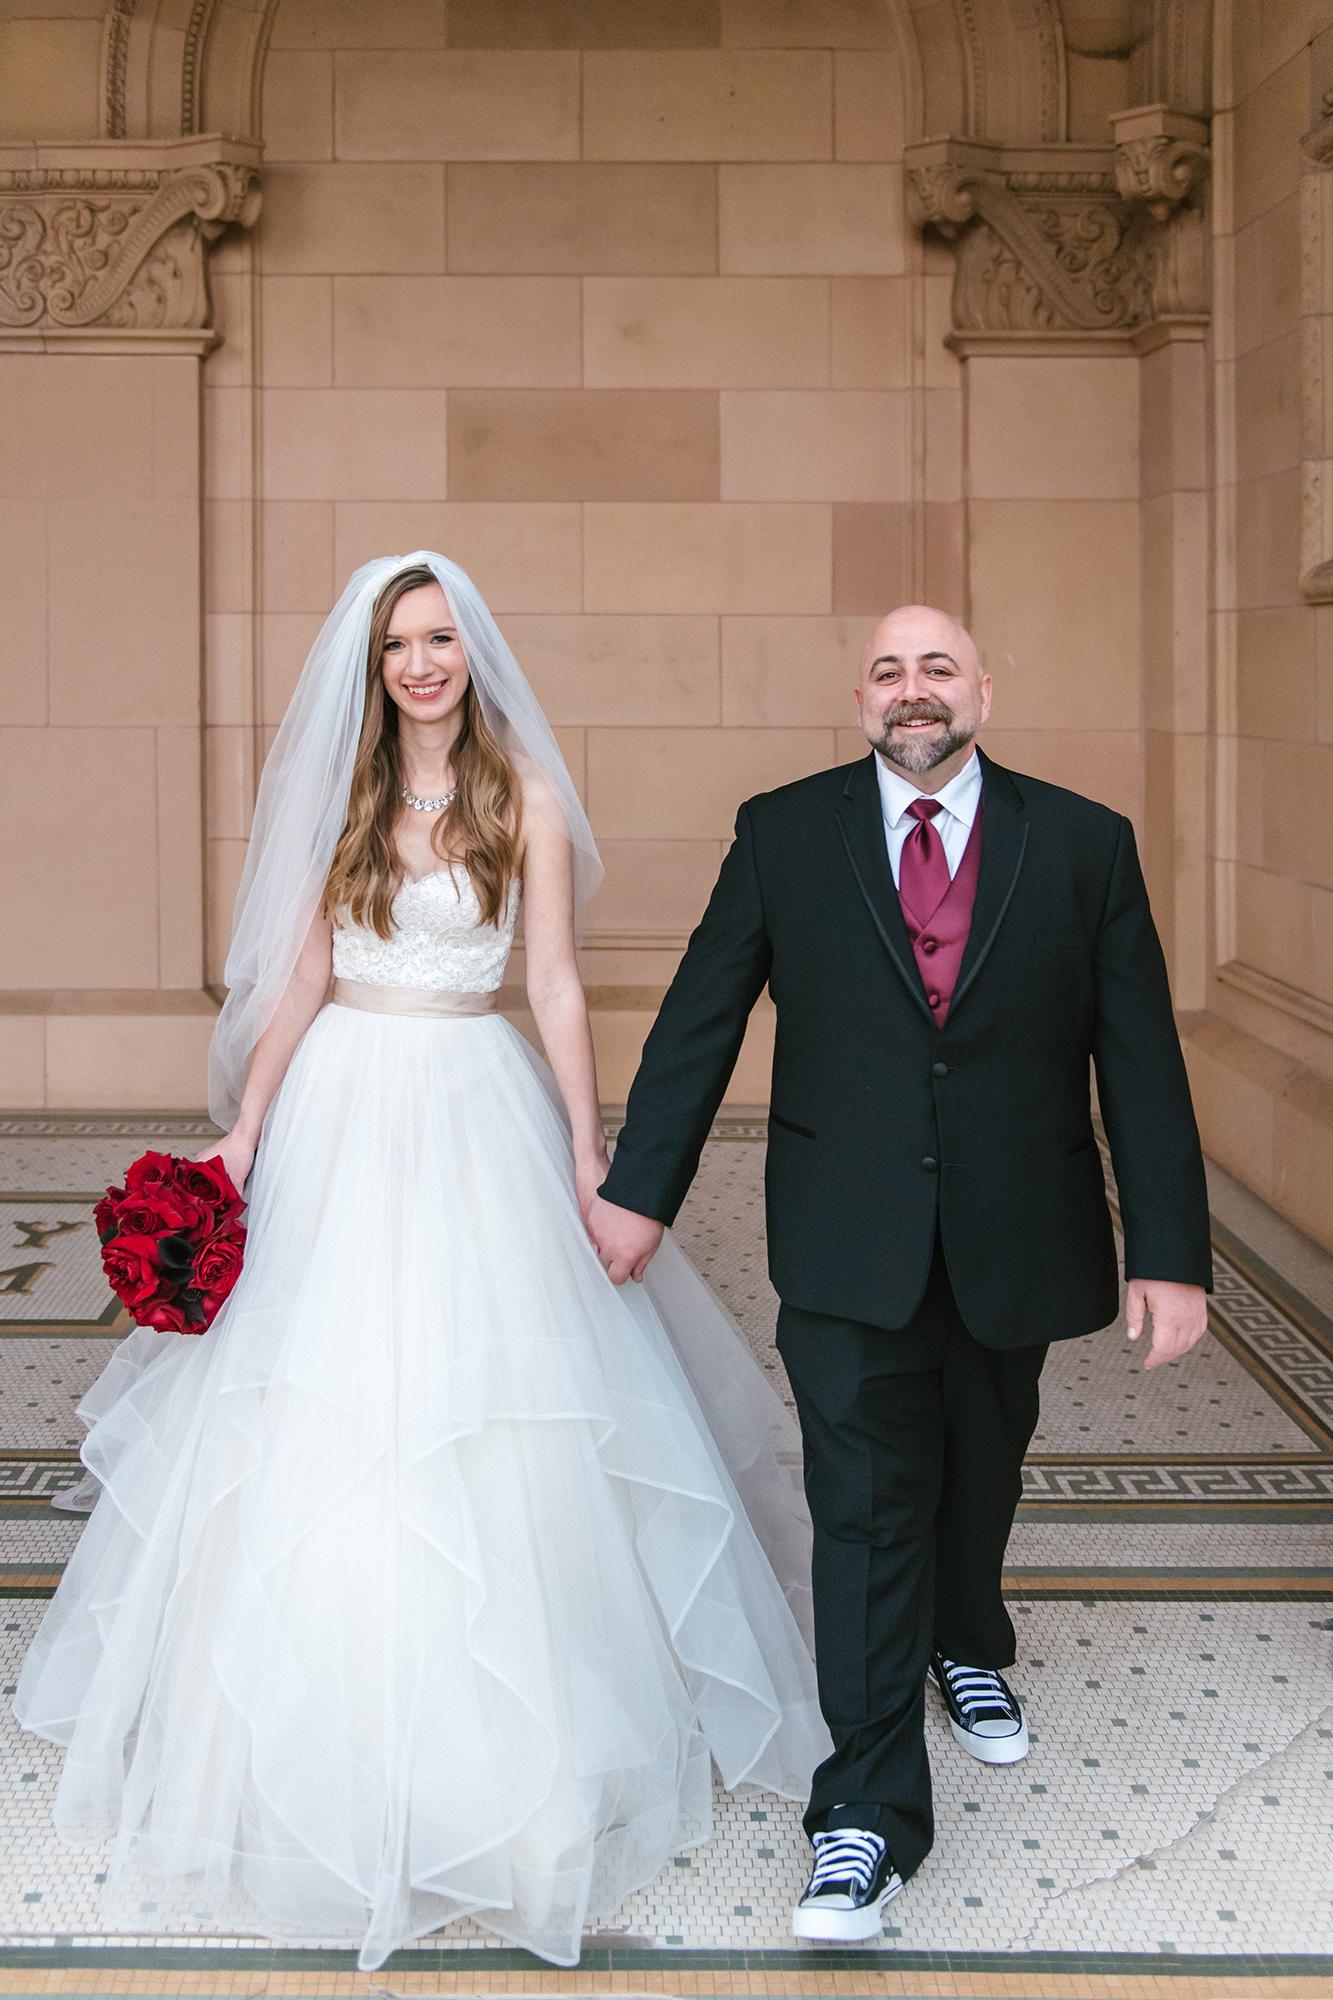 duff goldman johnna colbry couple walking together